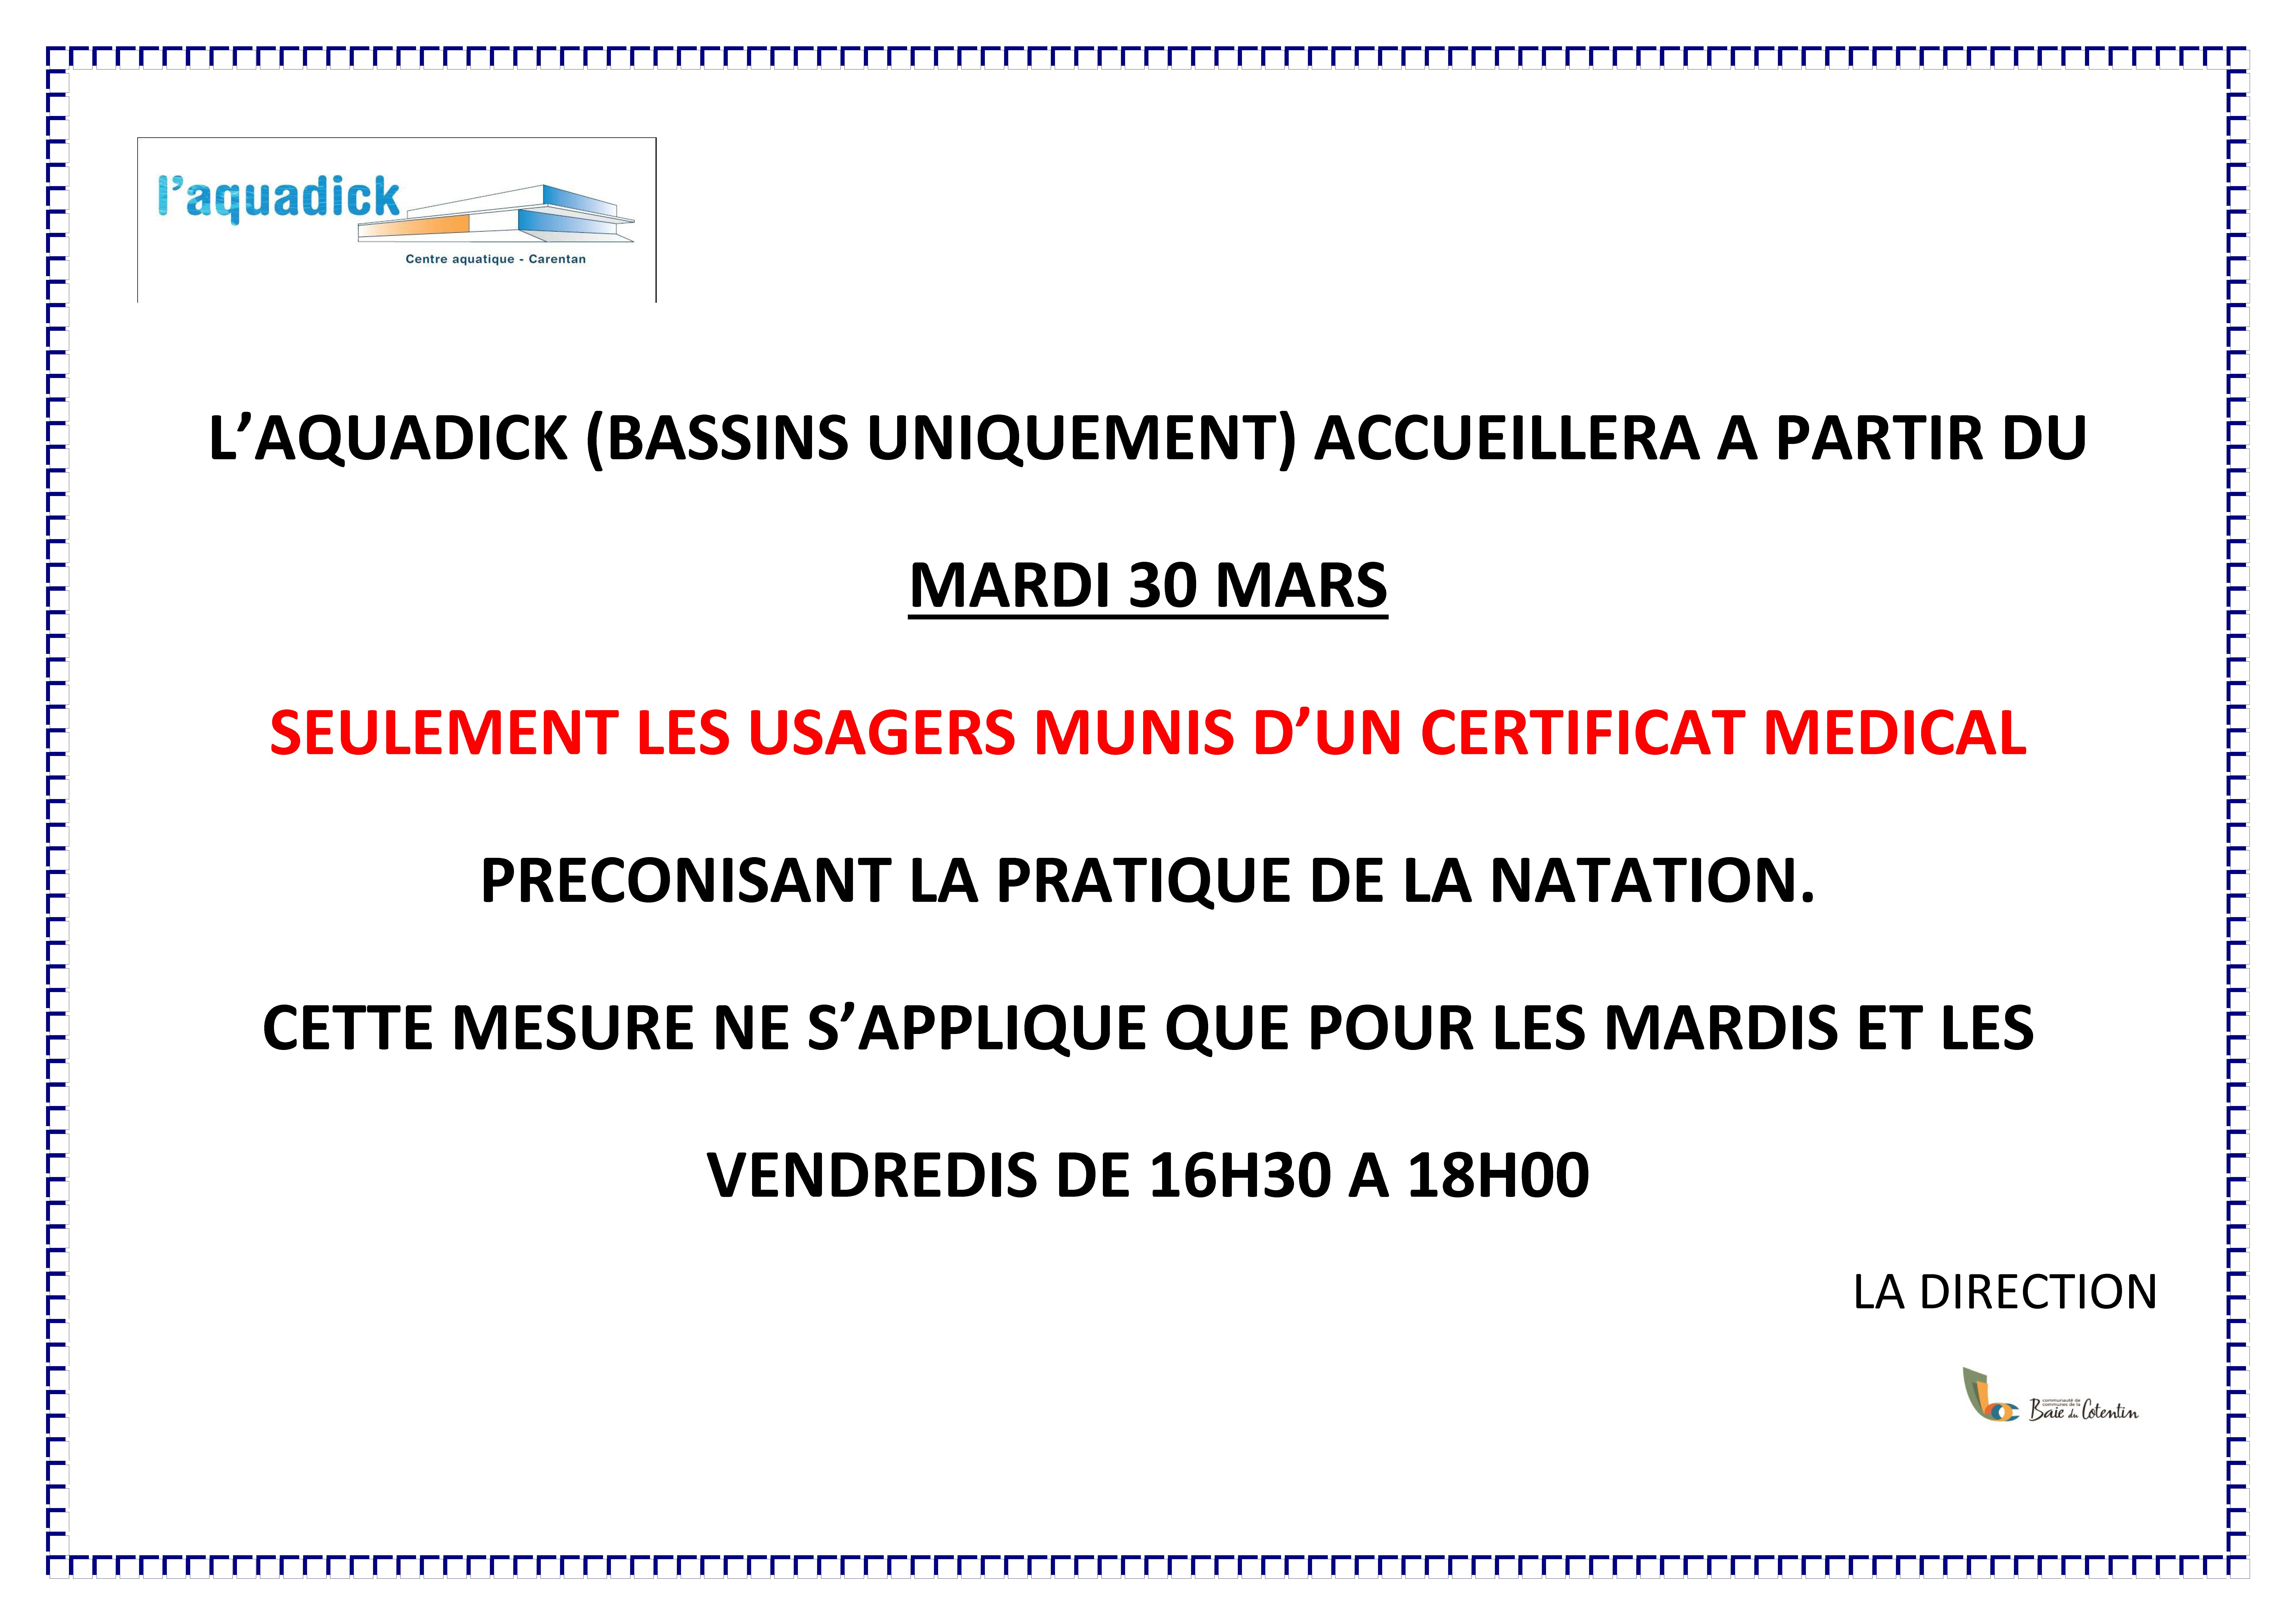 NATATION AV CERTIFICAT MEDICAL à partir du 30-03-A3